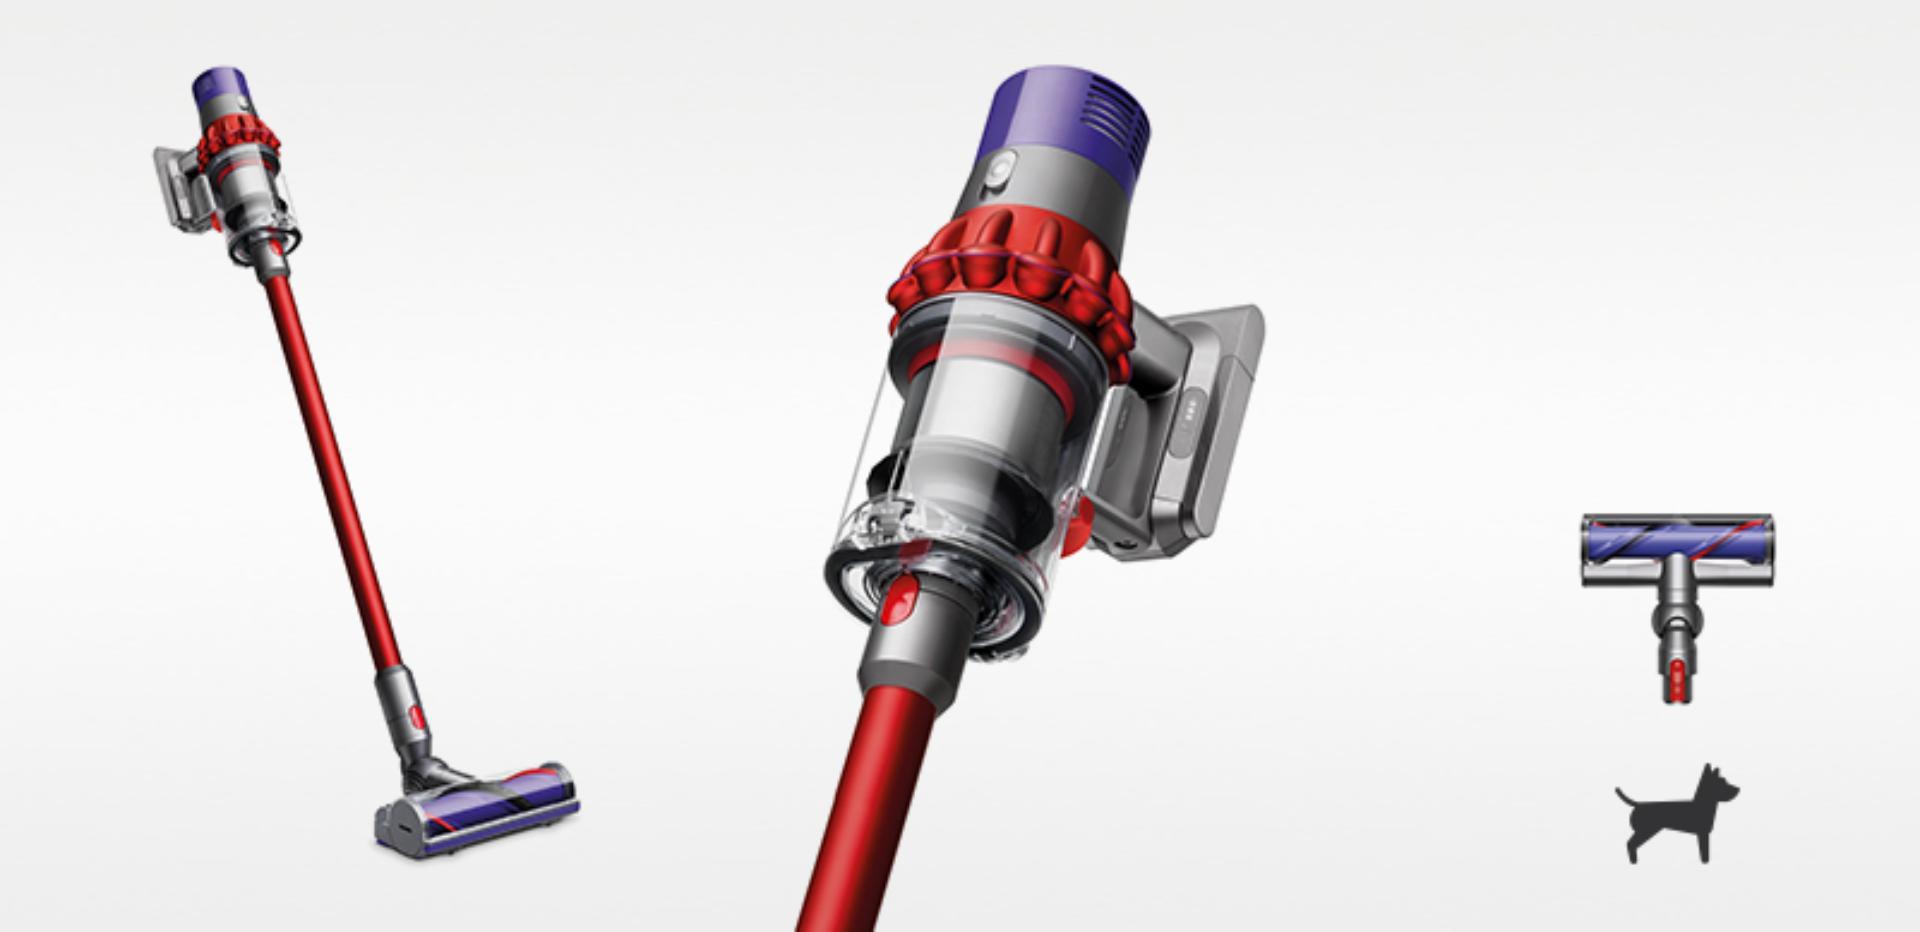 Image showing Dyson V10 Motorhead